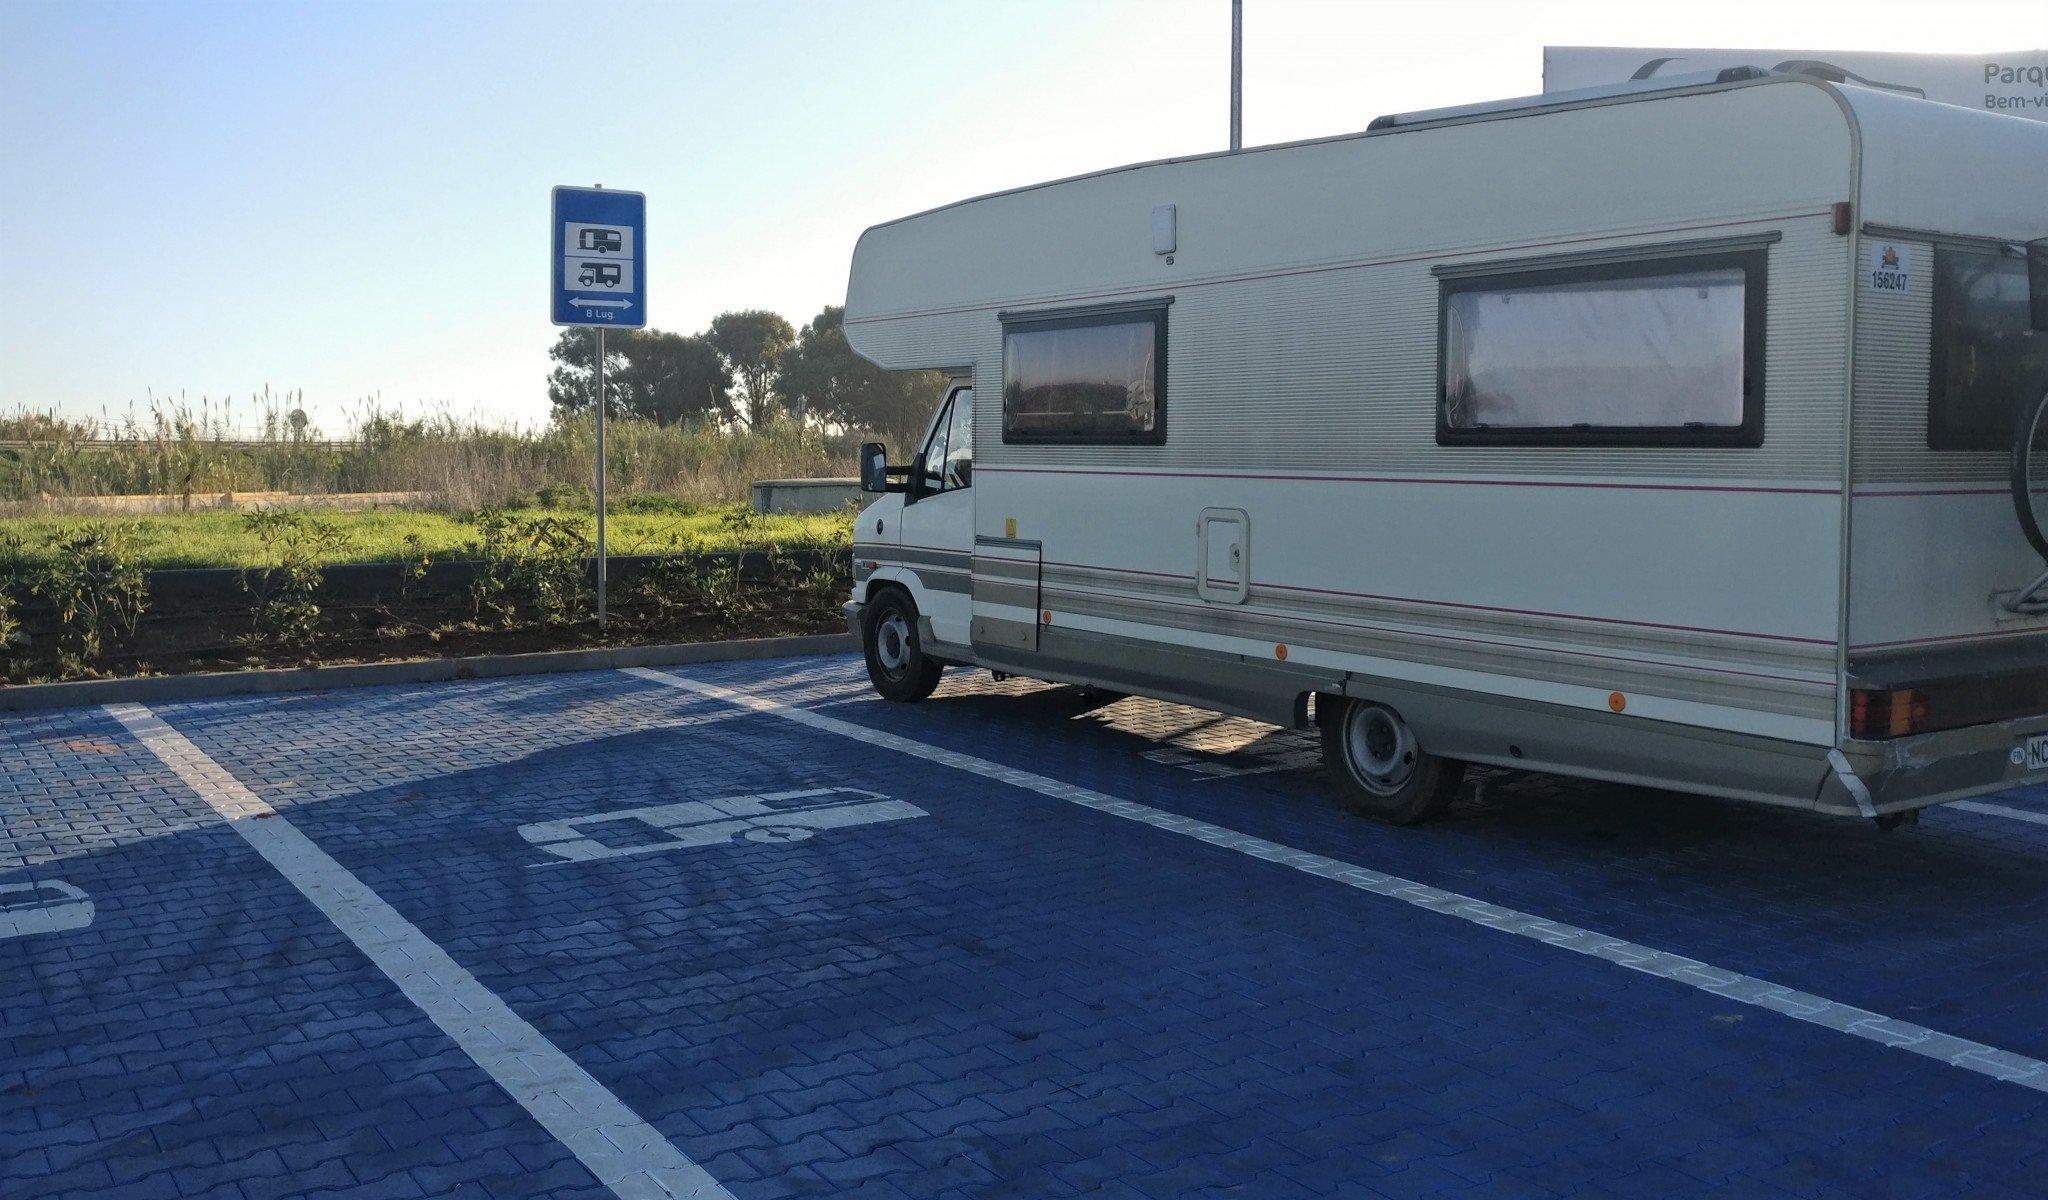 Lidl caravan parking